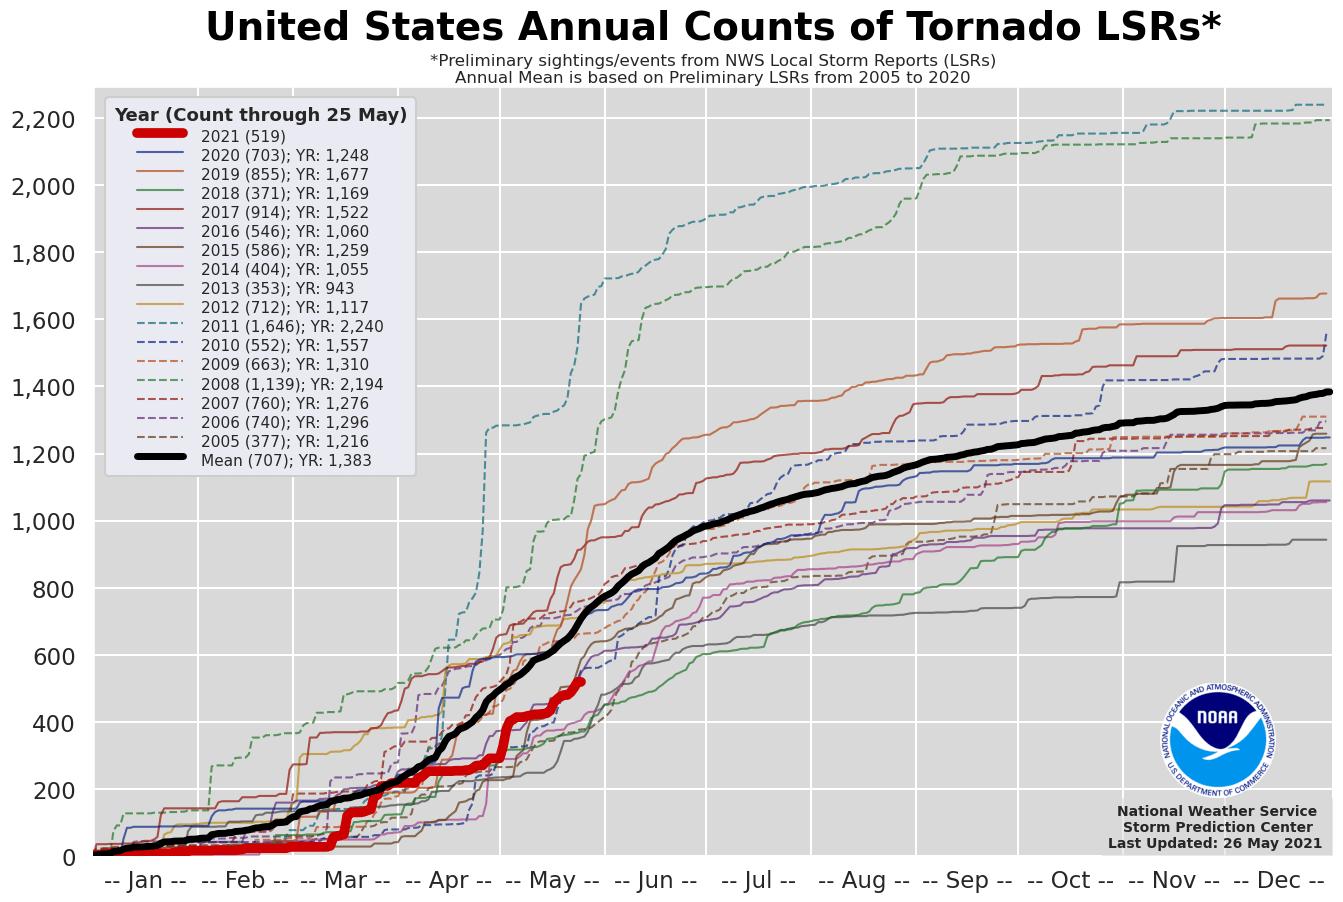 tornado-season-2021-forecast-severe-weather-outbreak-statistics